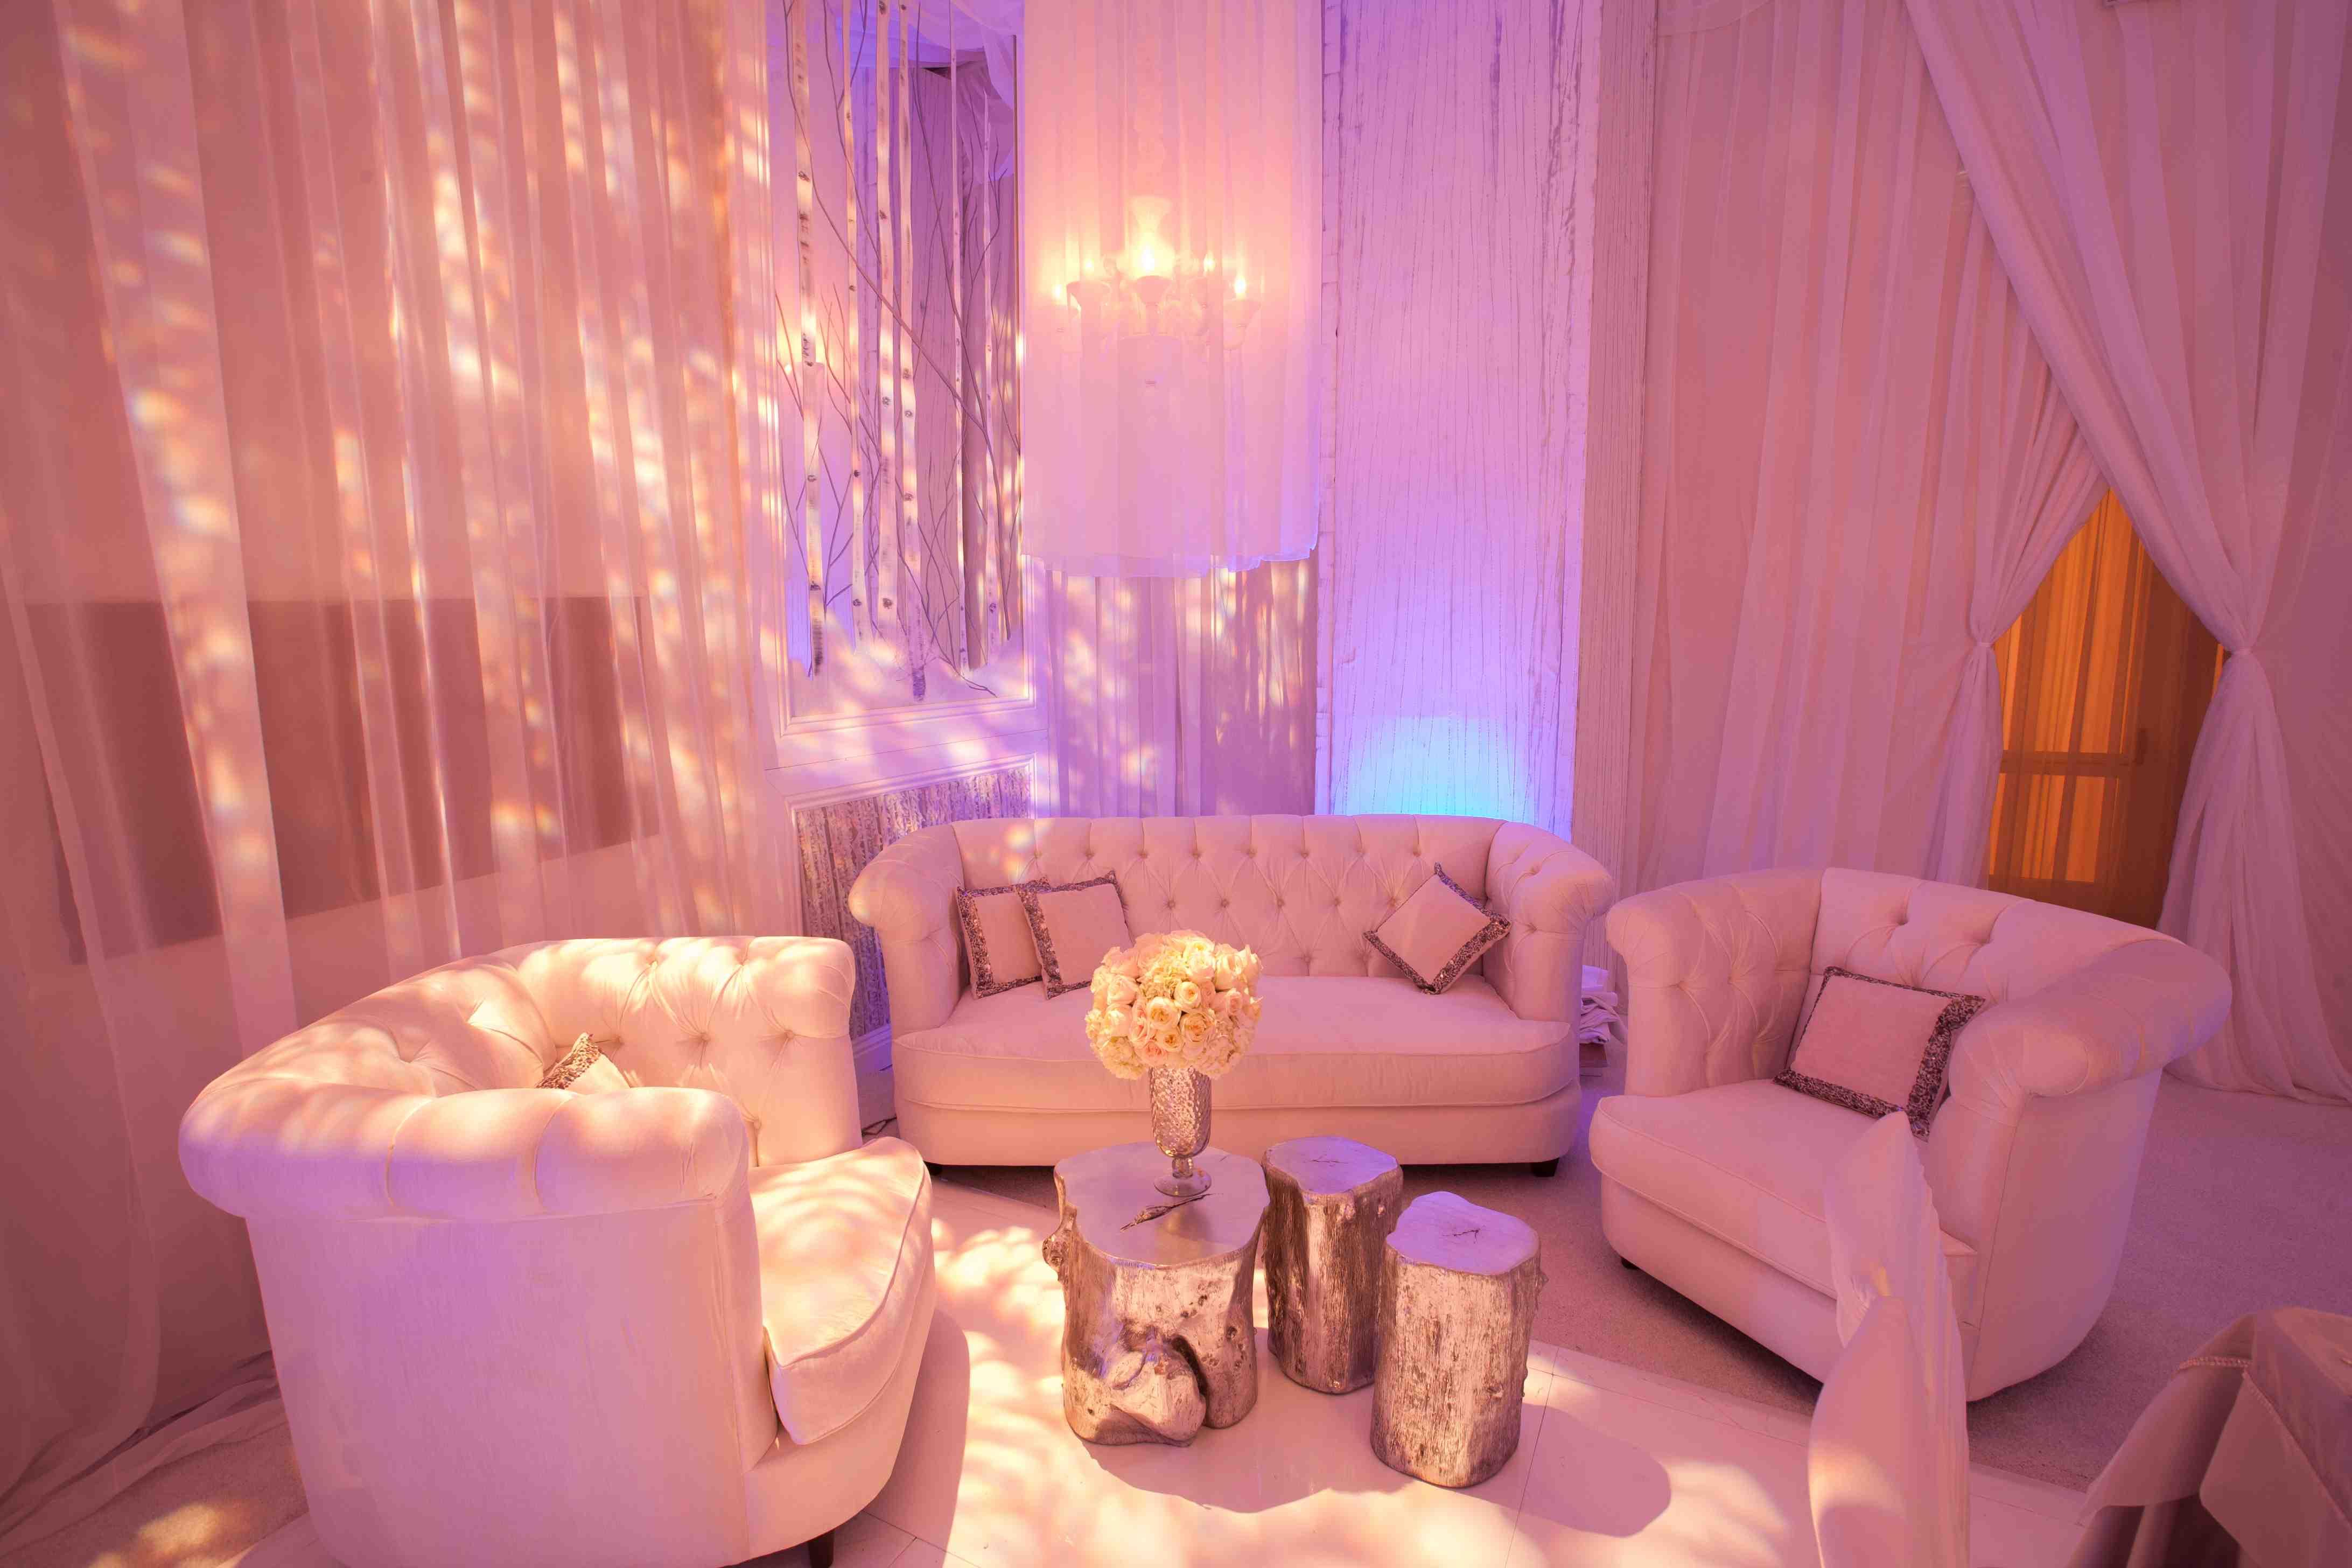 Purple lighting at tufted lounge area